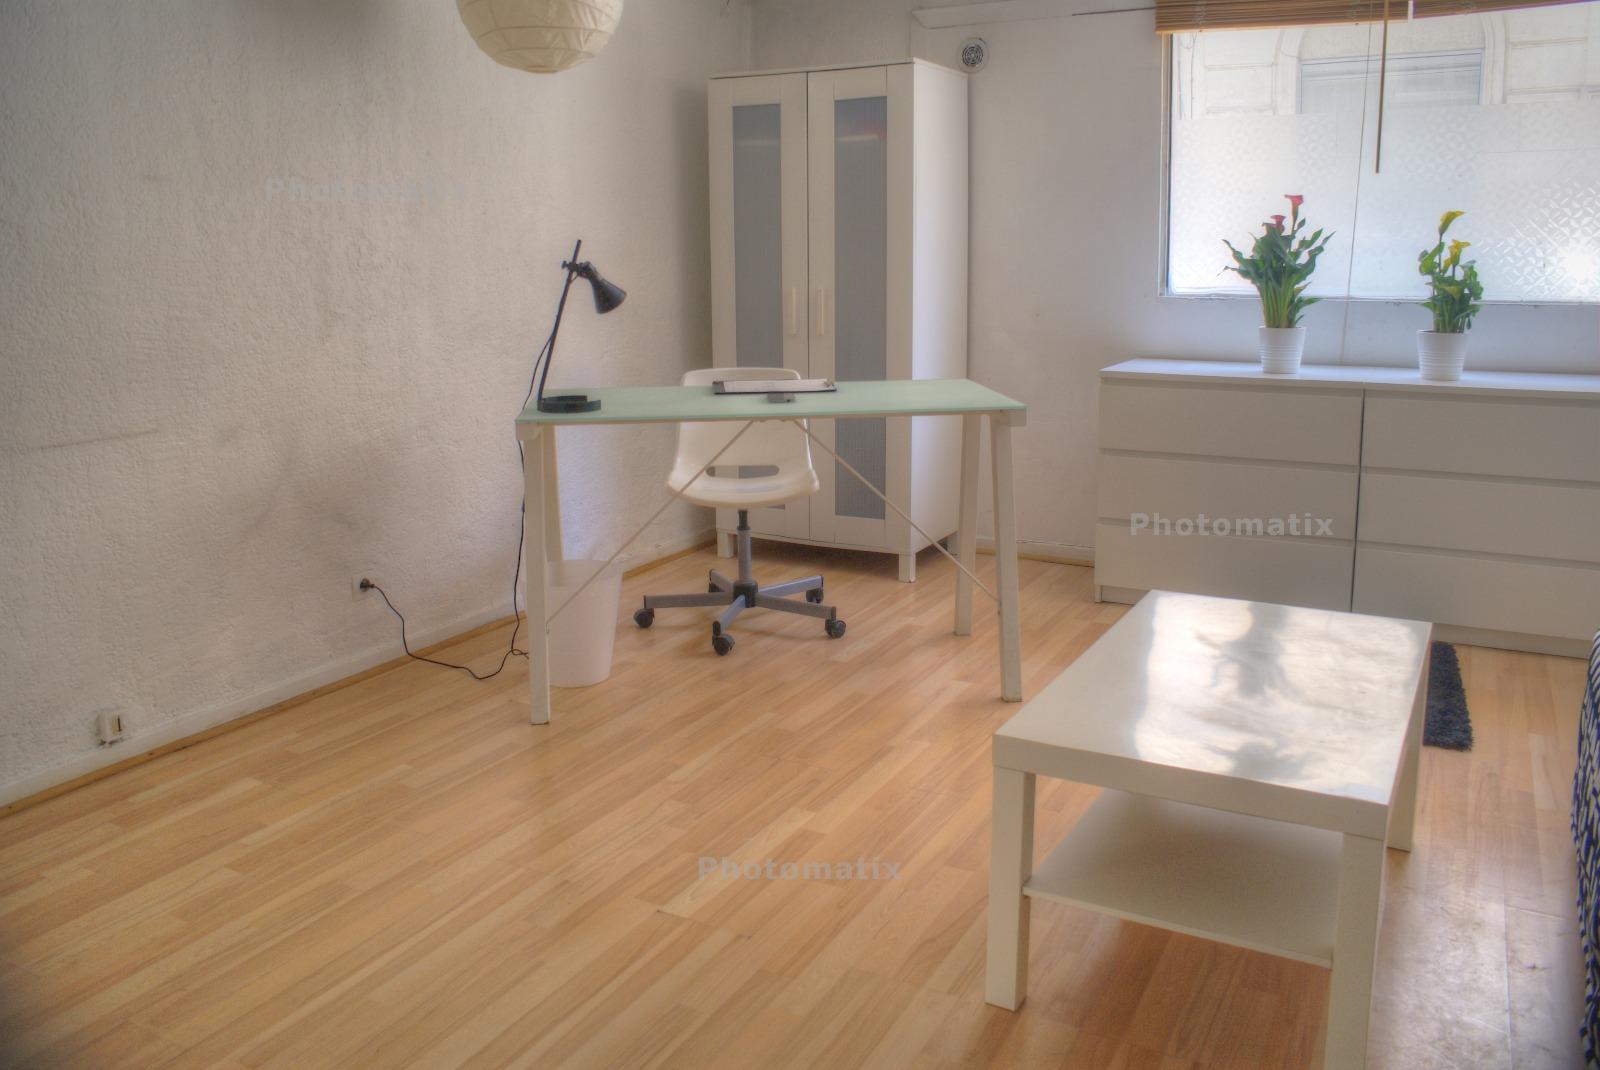 A Louer Studio Meubl Montpellier Antigone Description With Location Studio Meuble  Montpellier